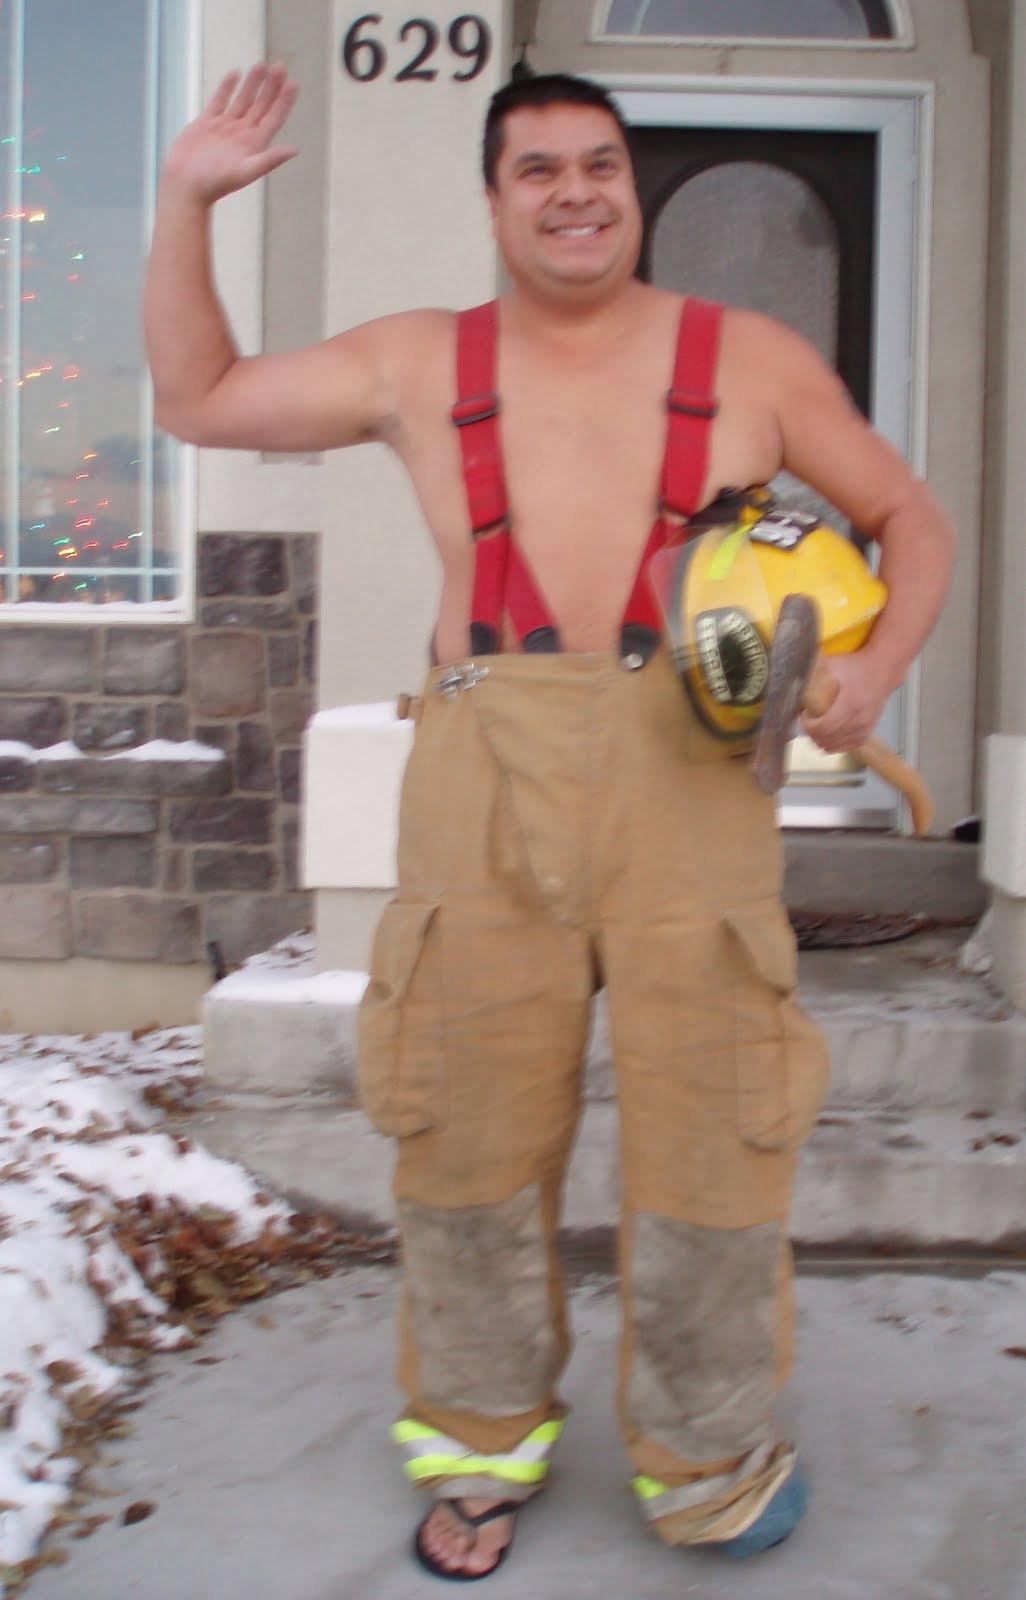 Wave At The Bus: Day 64 – Firefighter Calendar Hunk Hunk Short Timers Calendar